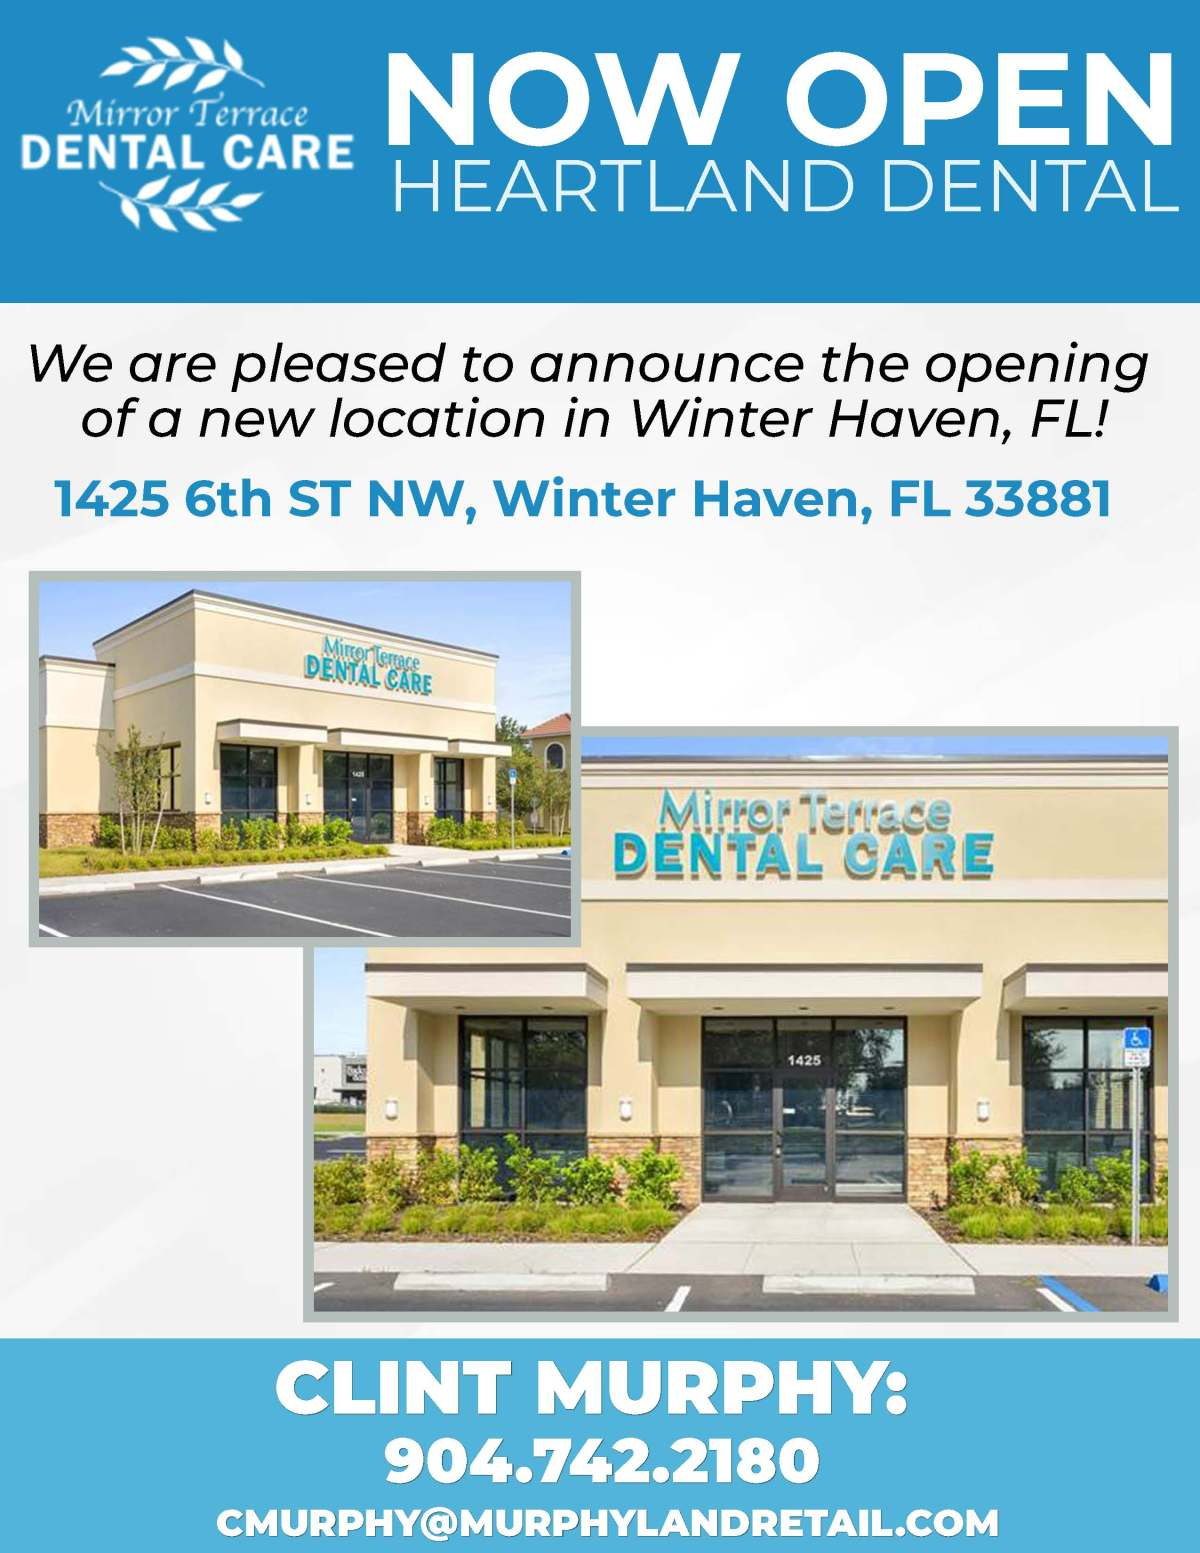 Mirror Terrace Dental Care